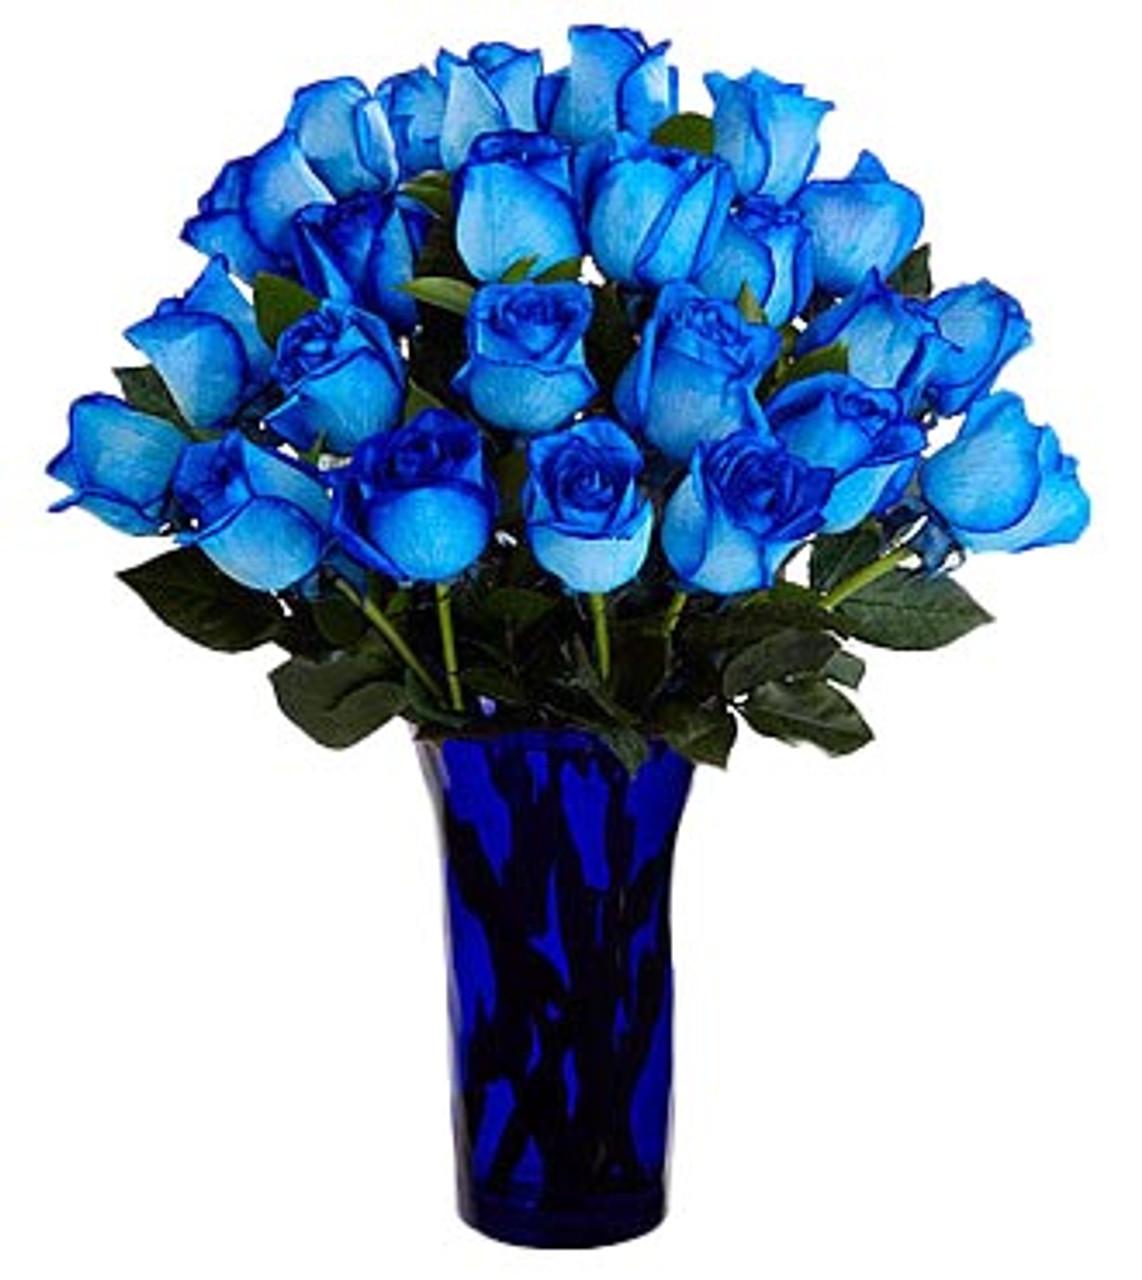 24 Blue Ecuadorian Roses